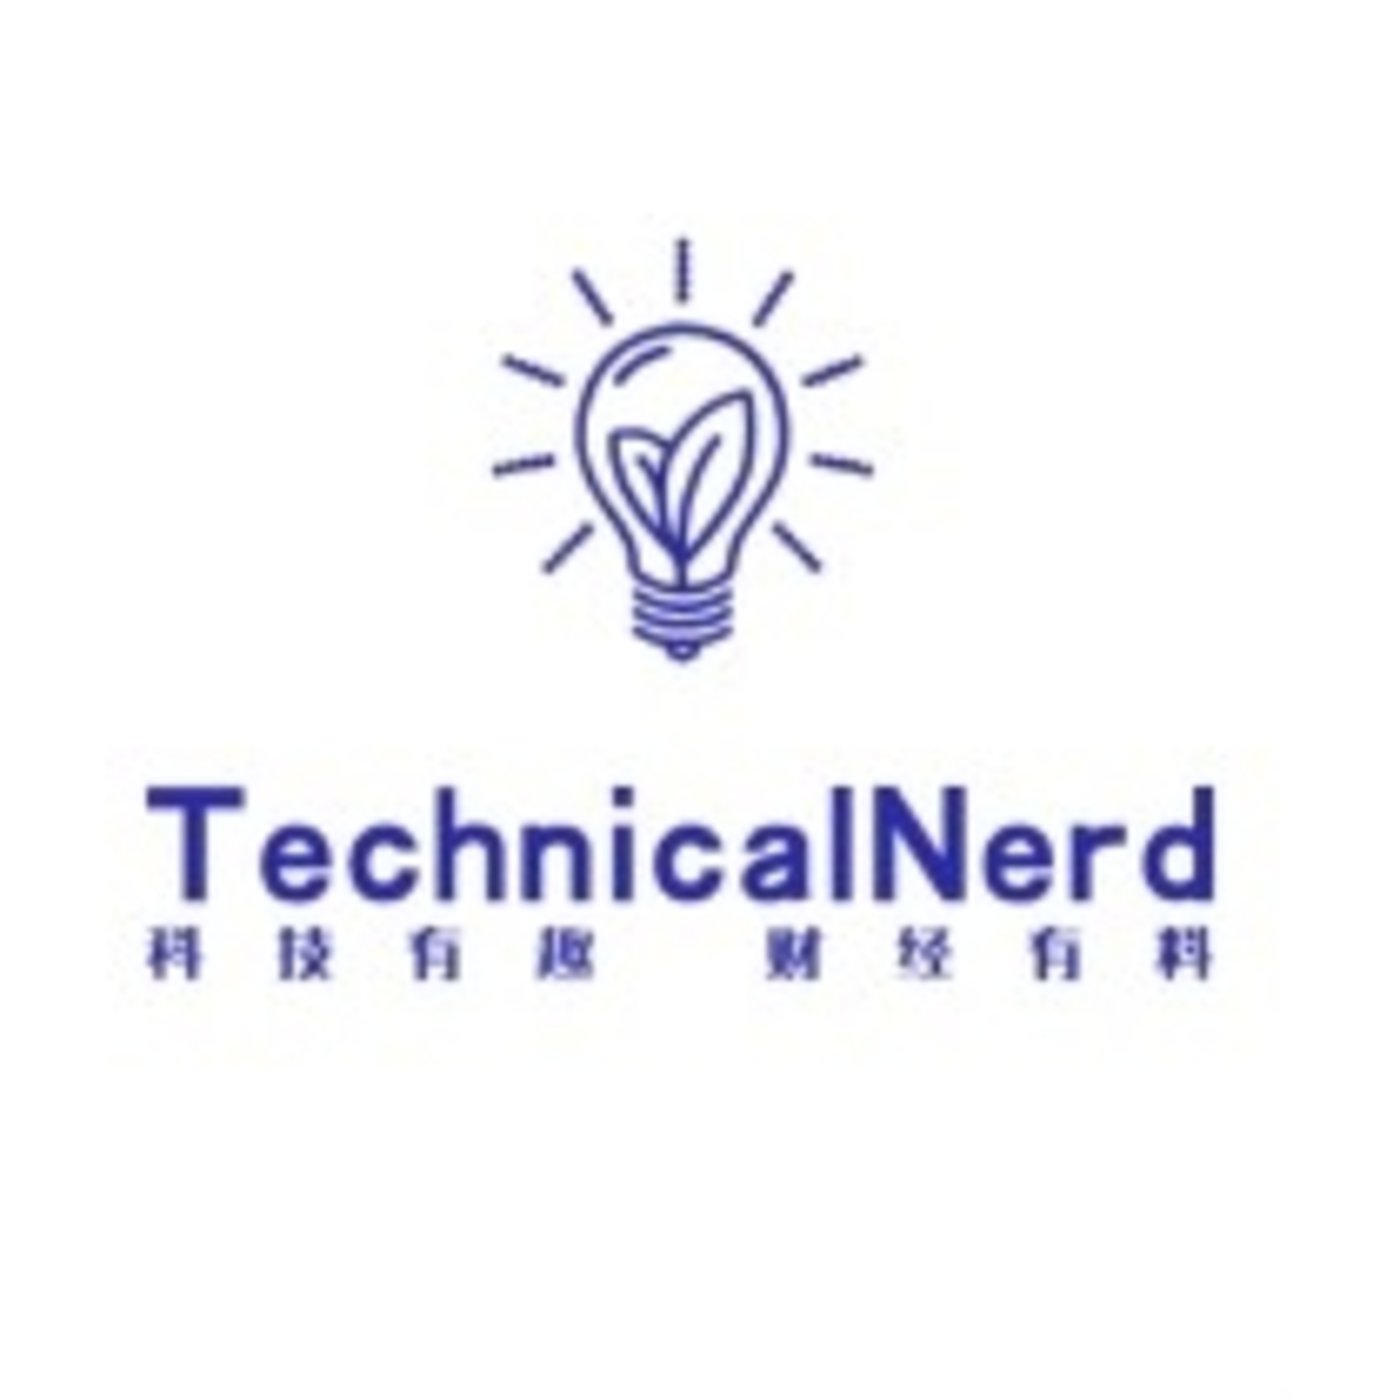 TechnicalNerd